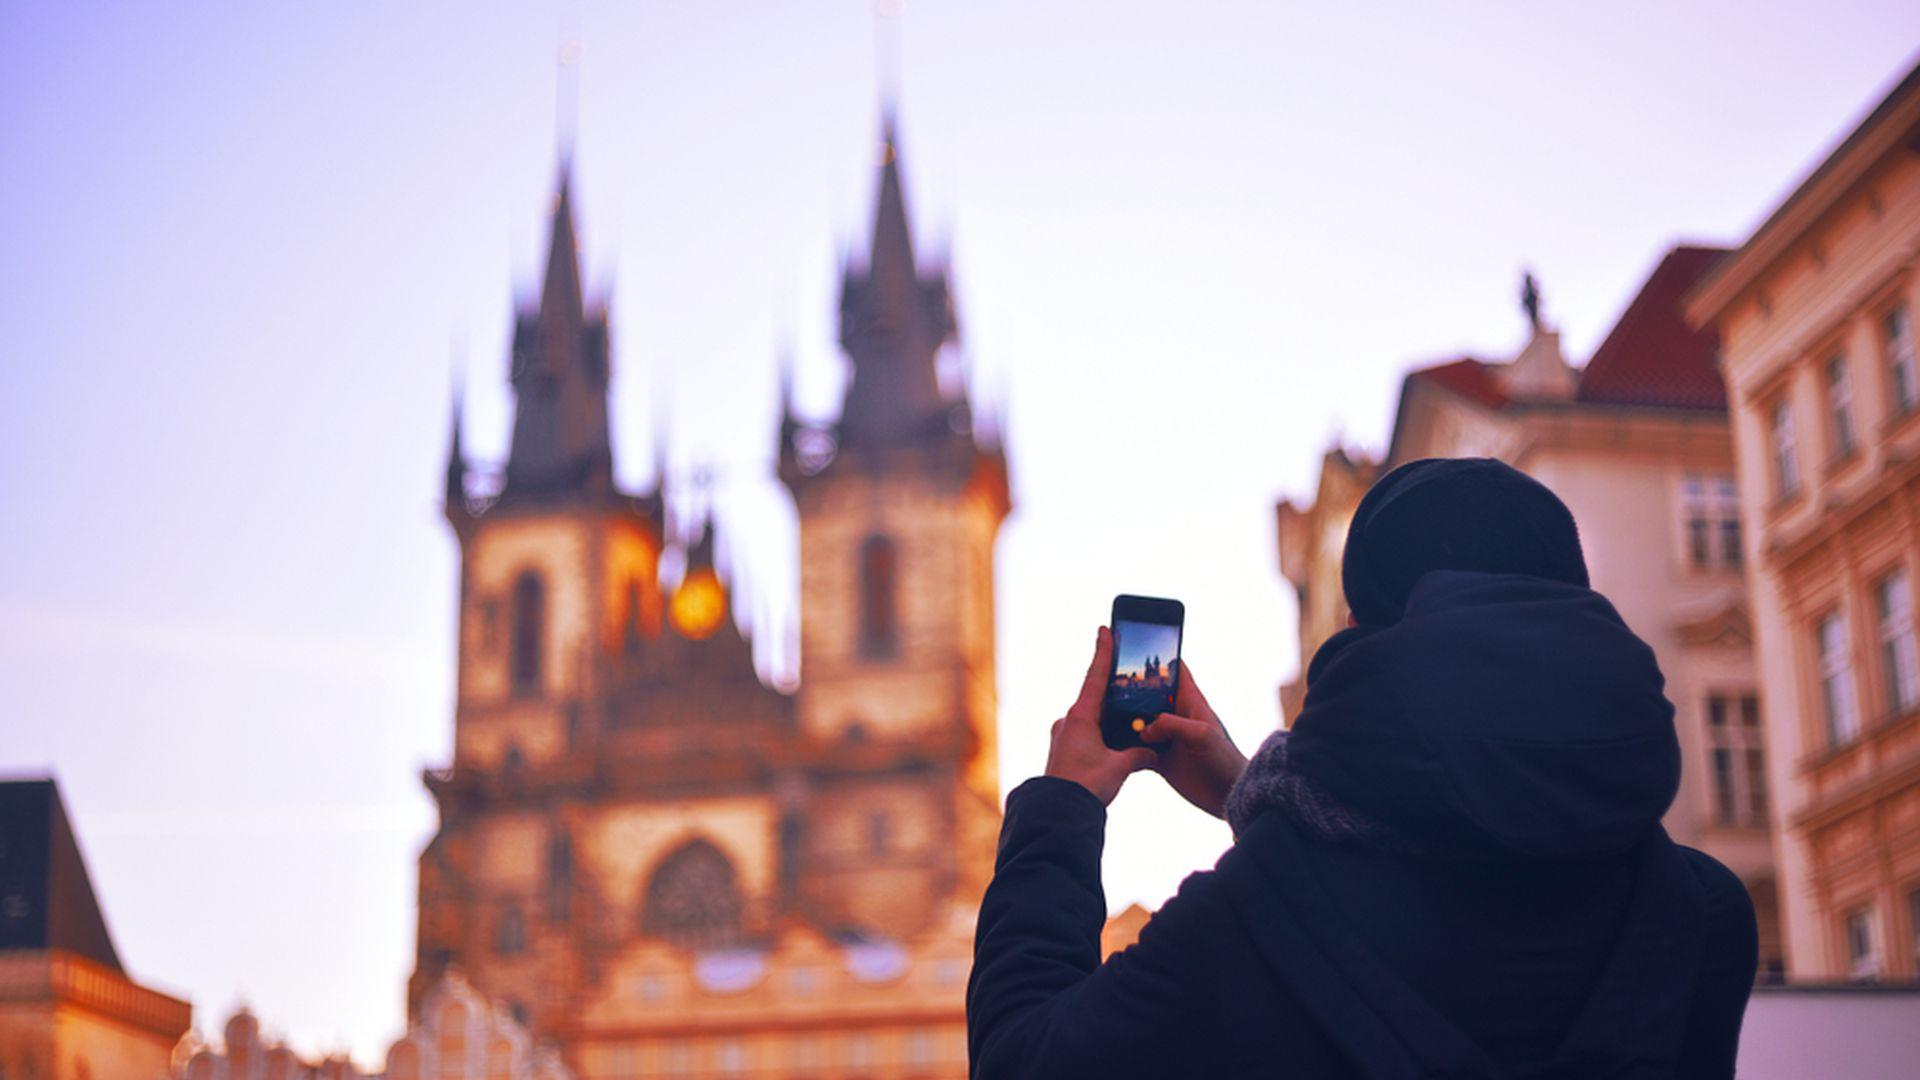 Prague Old Town & Jewish Quarter: Walking Tour with Audio Guide